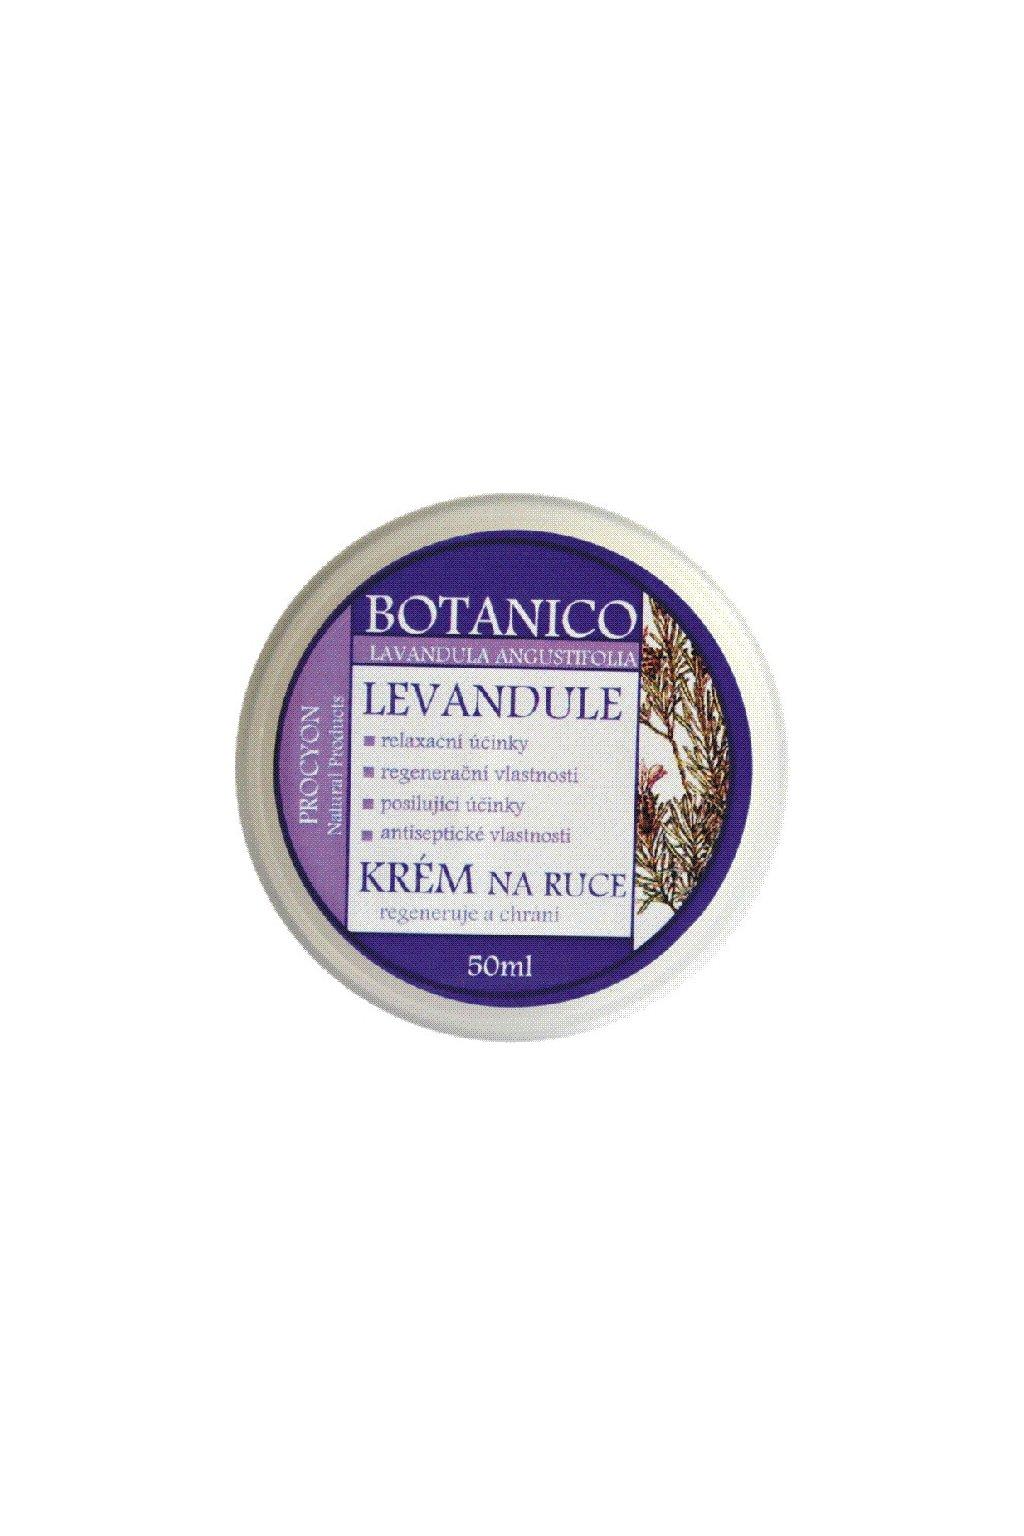 Botanico - Levandulový výživný krém na ruce - 50ml